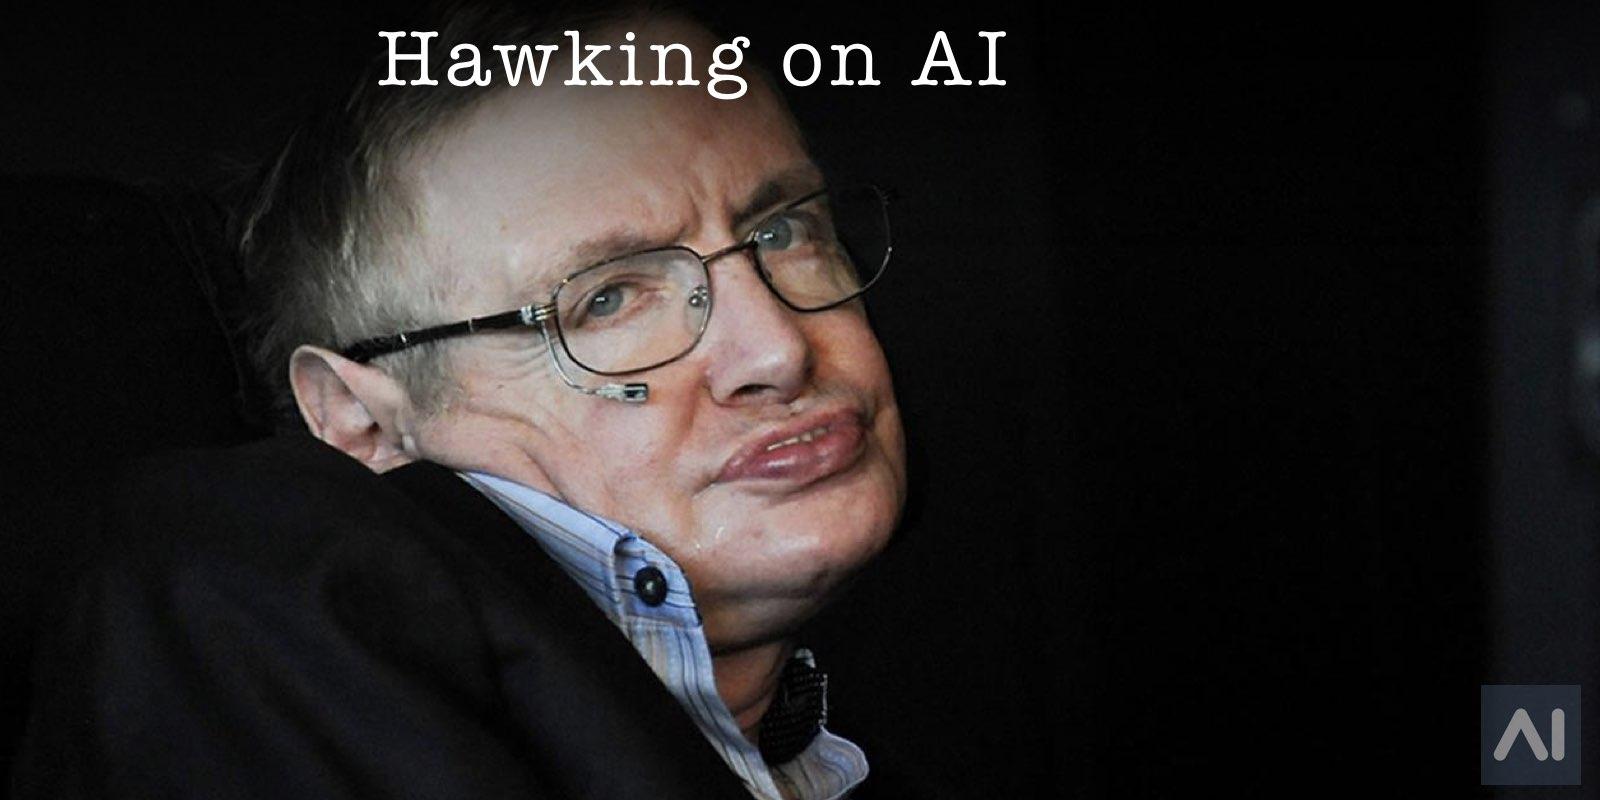 Stephen Hawking on AI